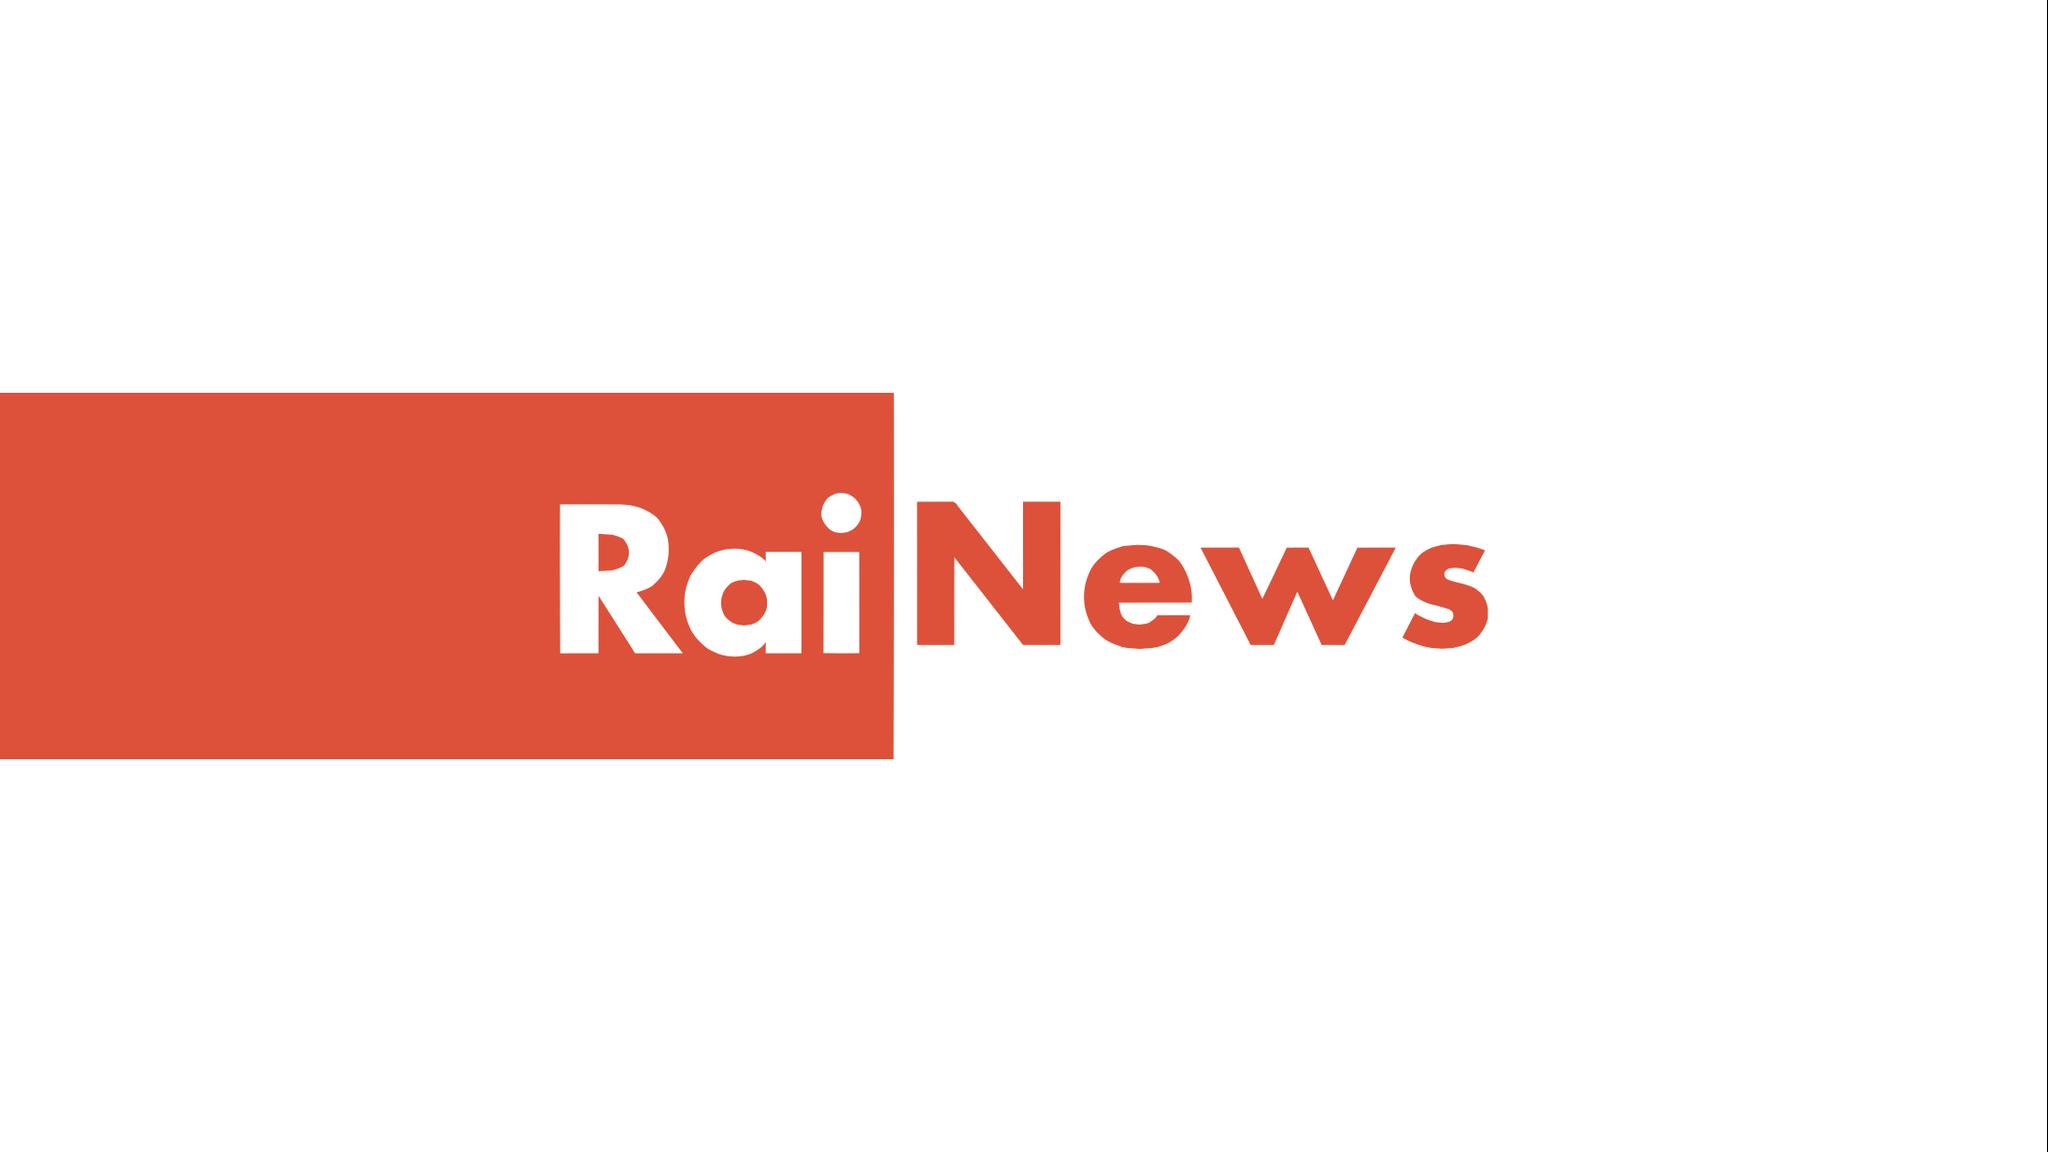 Rai News 24 seconda serata, guida tv Rai News 24 seconda serata, Rai News 24 cosa fa stasera, Rai News 24 notte.